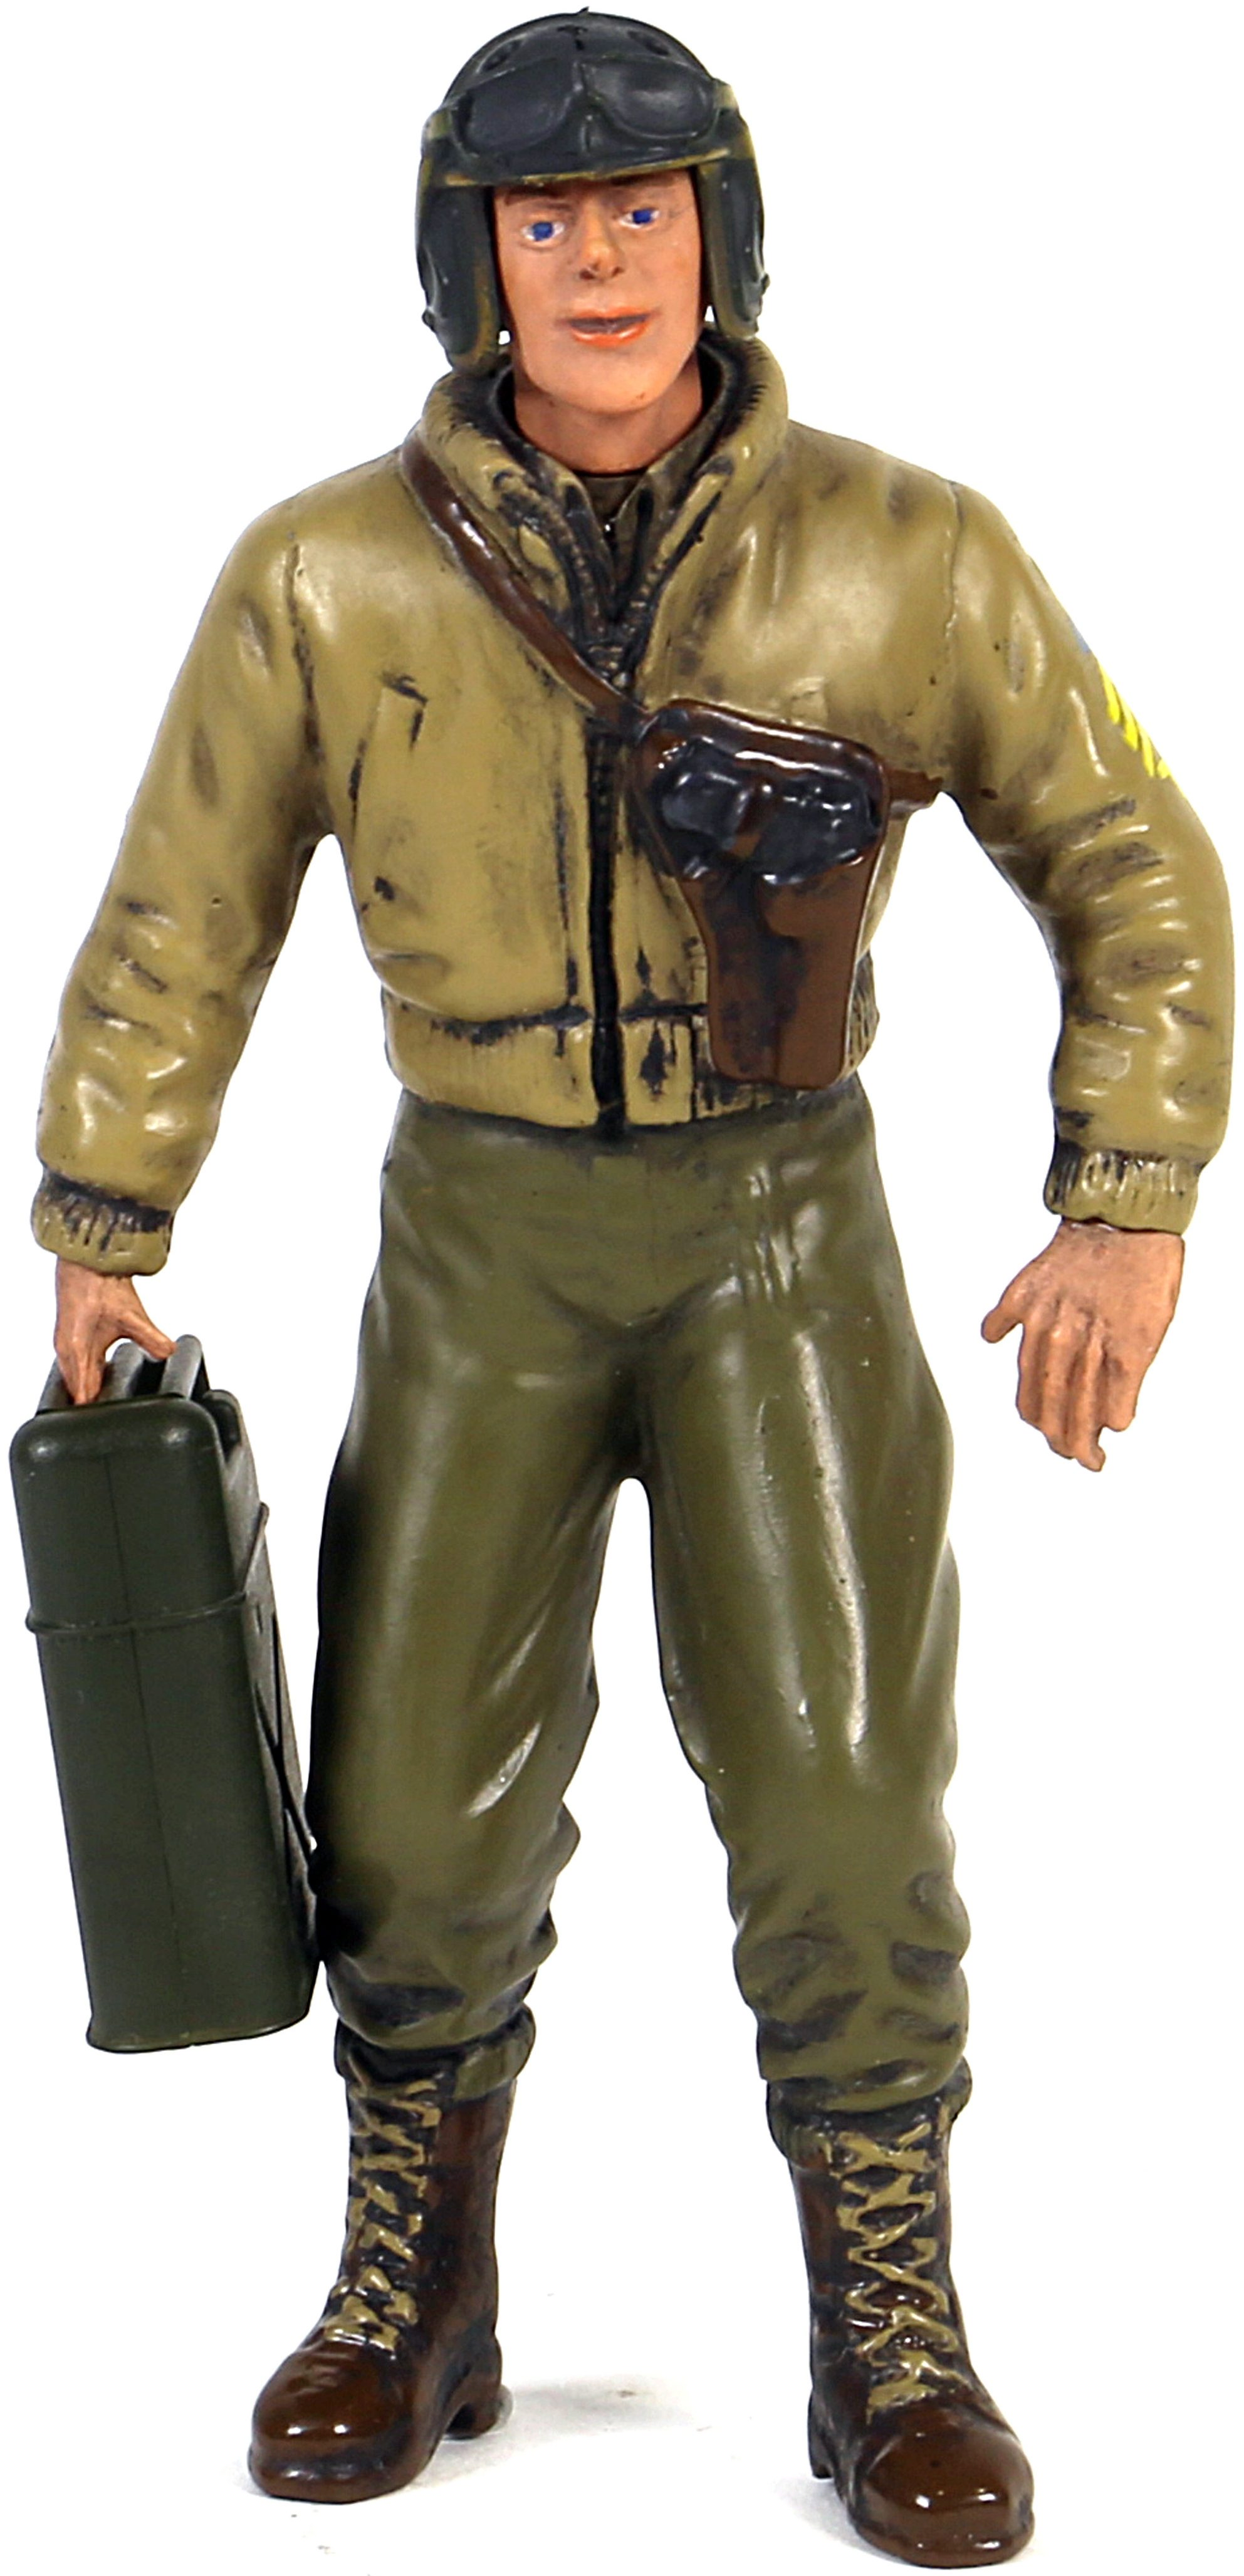 Torro Modellfigur, 1:16, »Figur Technical 3. Grade Mimms«